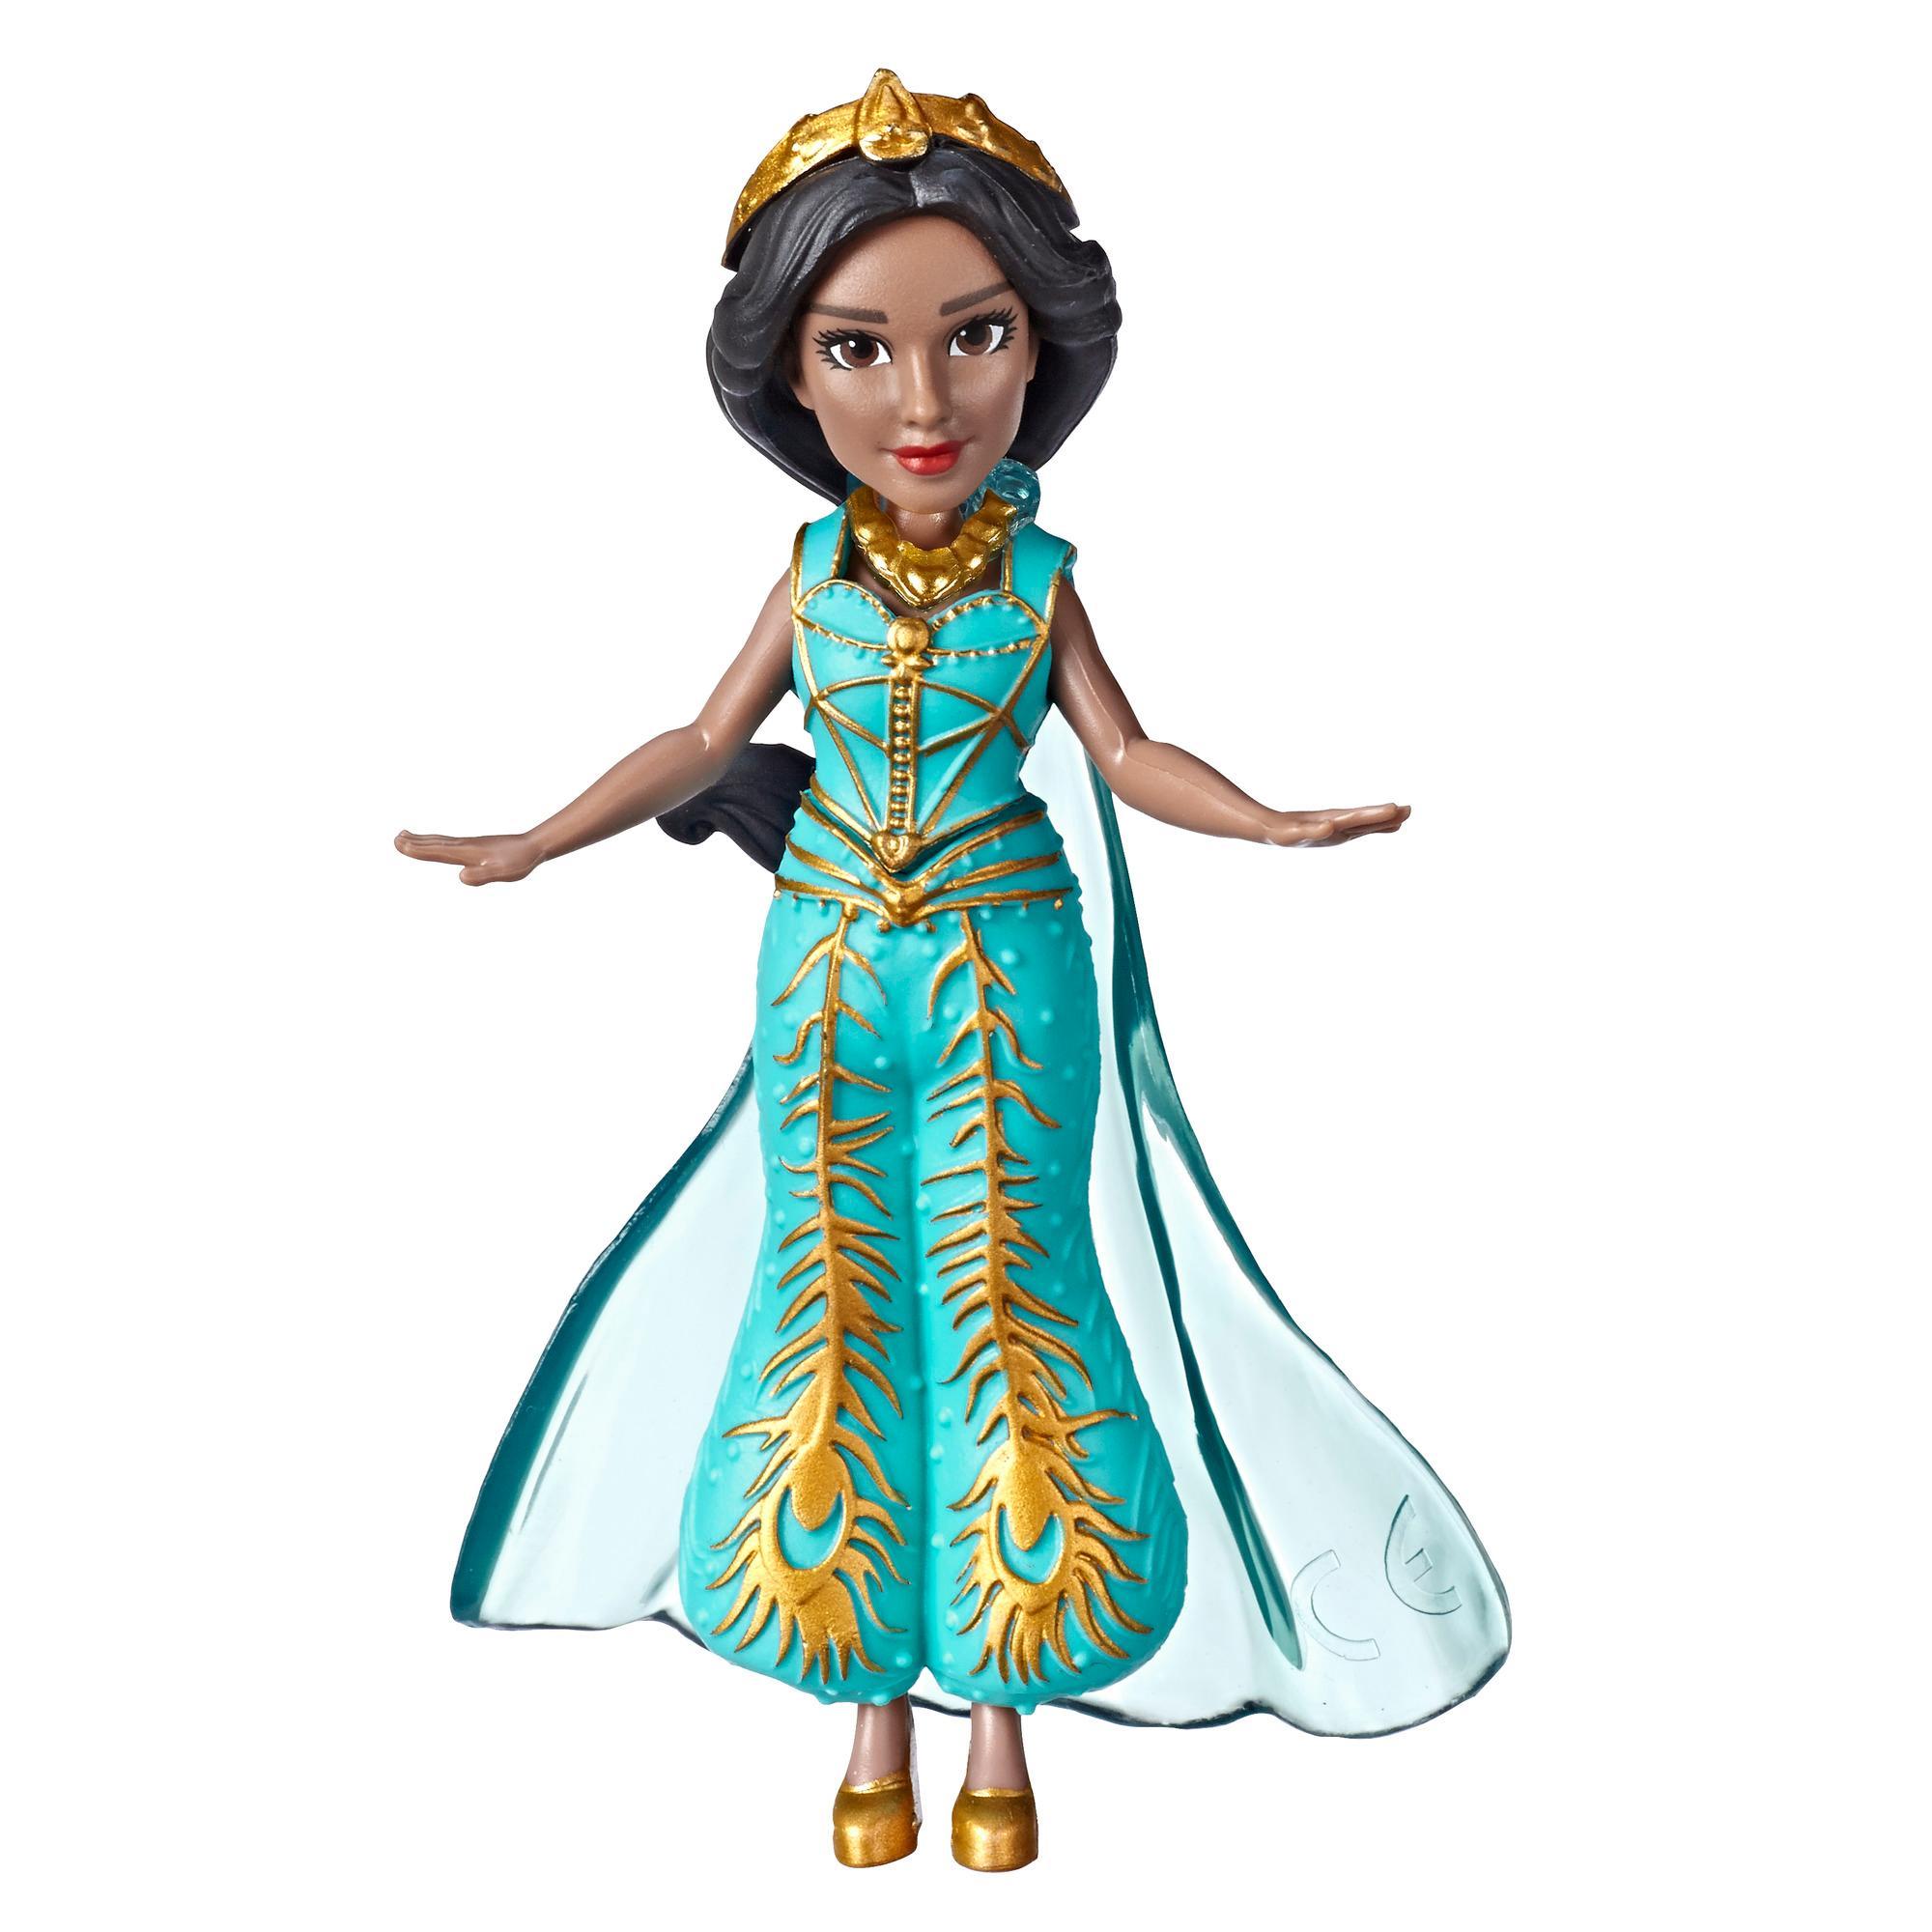 Disney Aladdin Mini Film Figür - Prenses Yasemin (Turkuvaz Giysili)